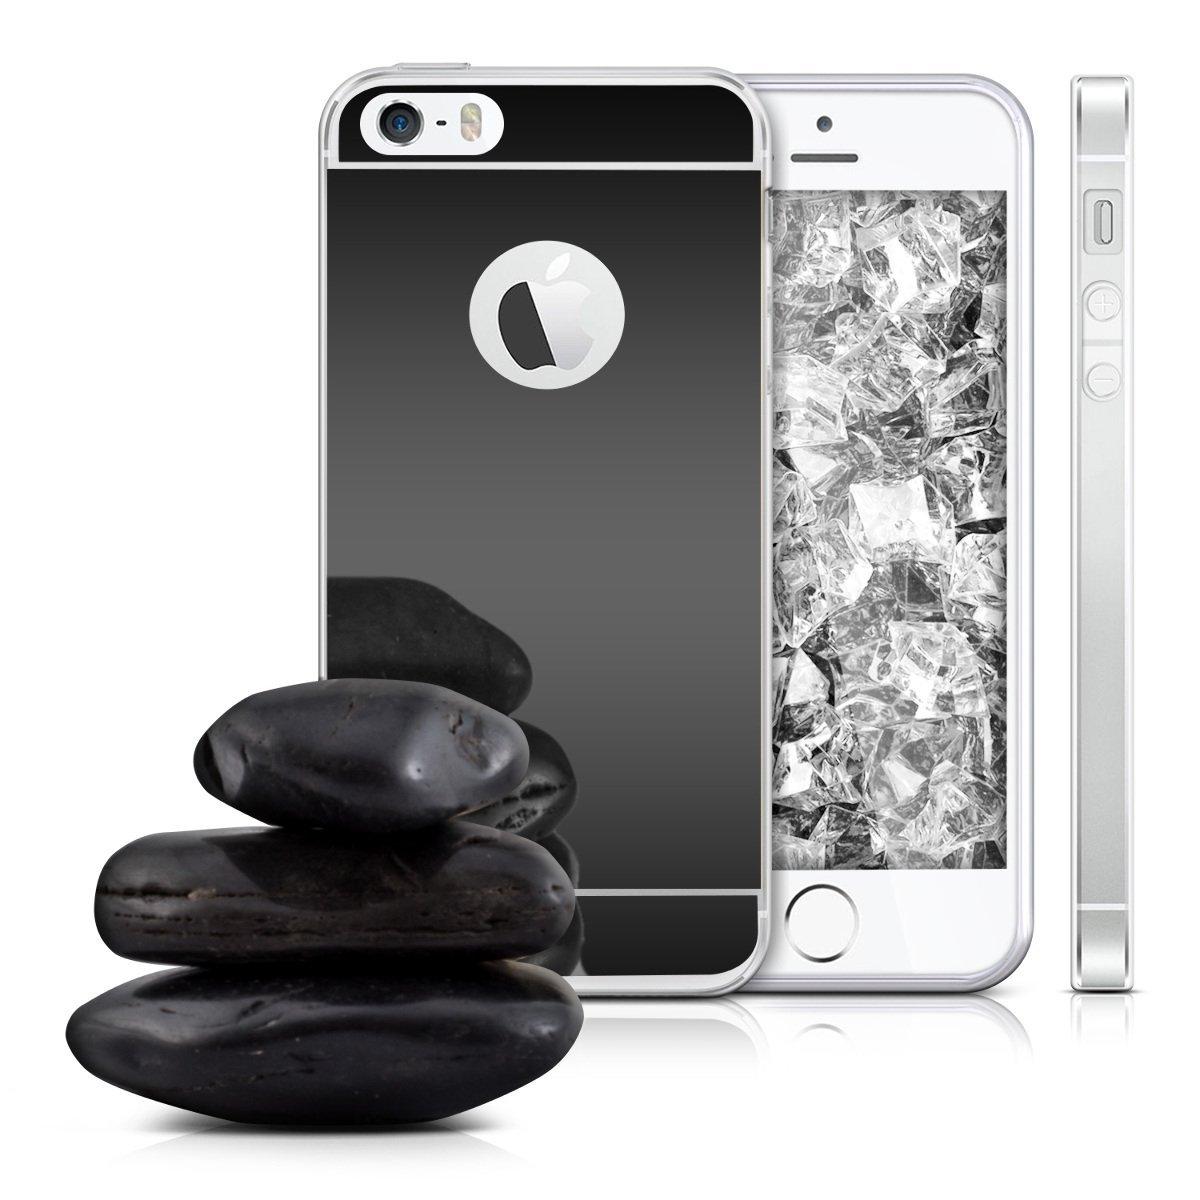 Zrcadlový kryt My Mirror pro iPhone SE / 5s / 5 - Černý (black)